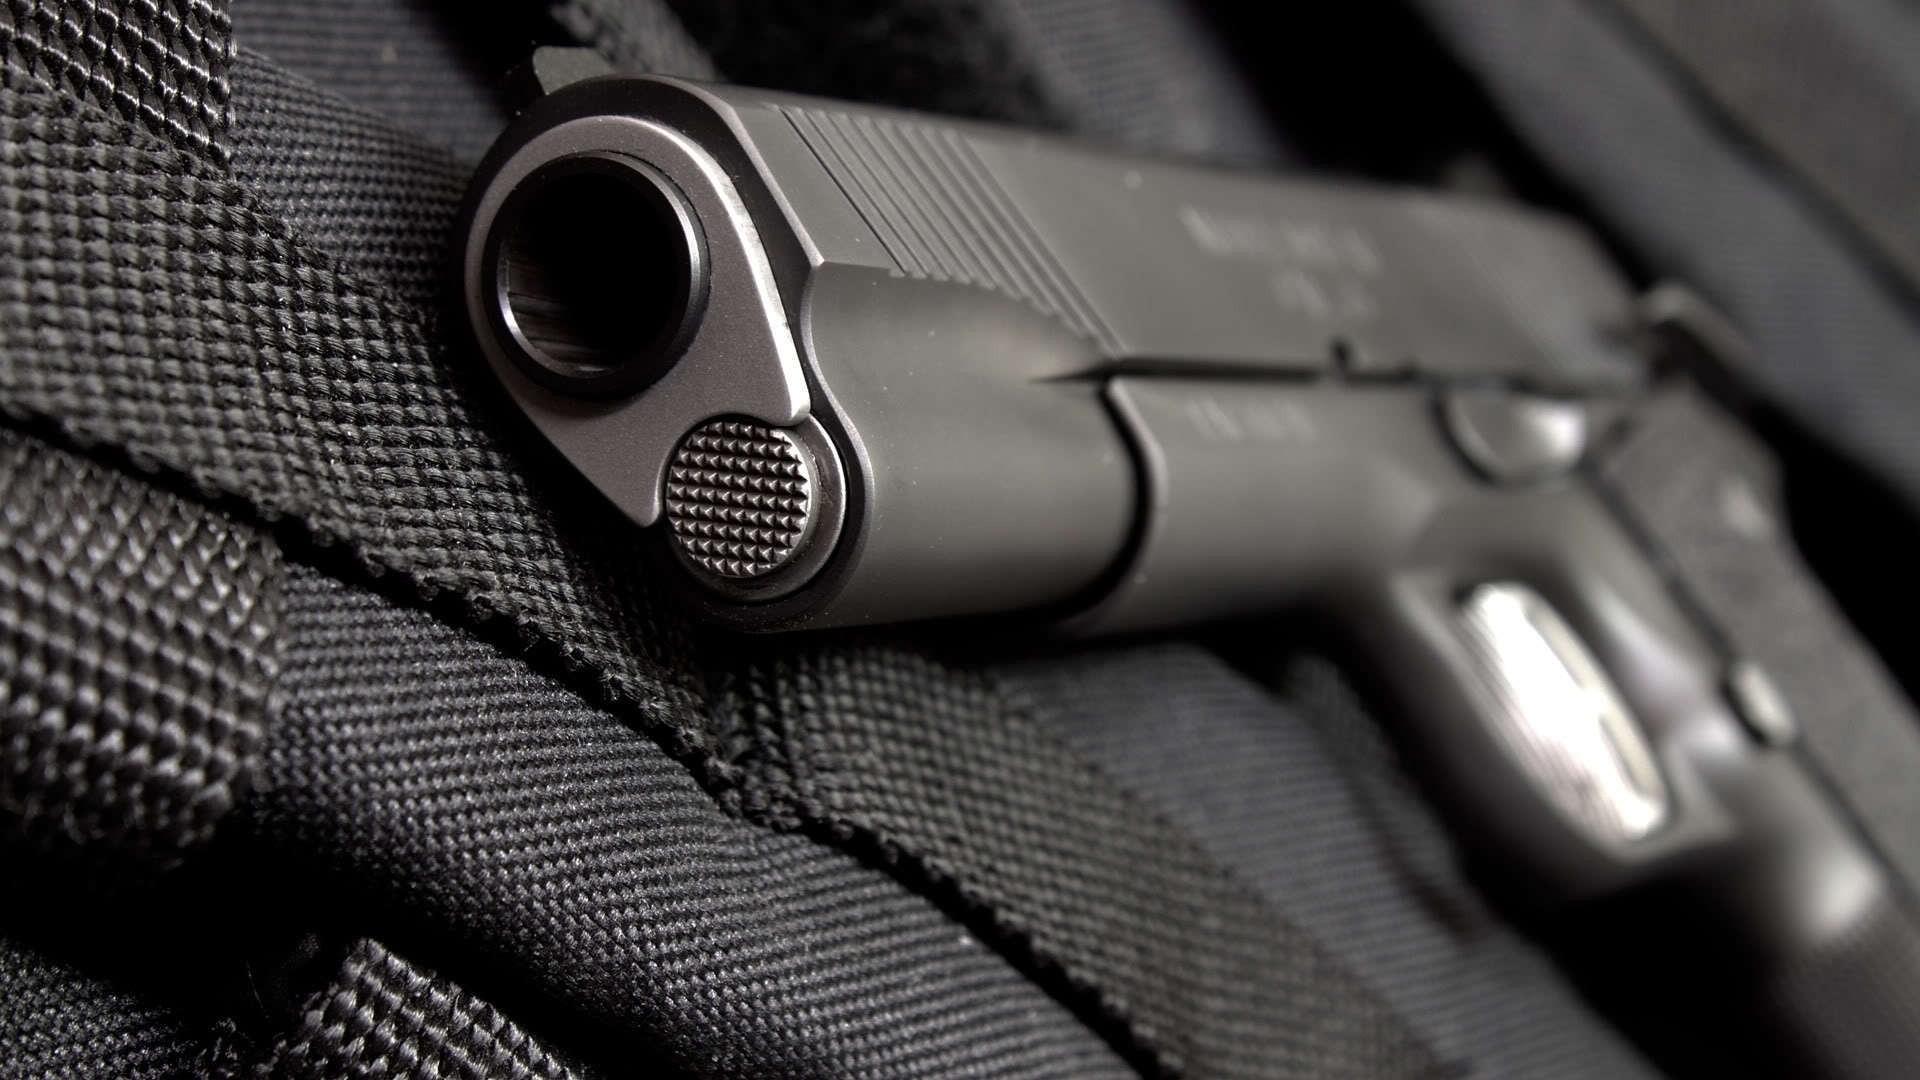 modern weapons – Google Search   WEAPONS_Modern Firearms   Pinterest   Hd  wallpaper, Guns and Weapons